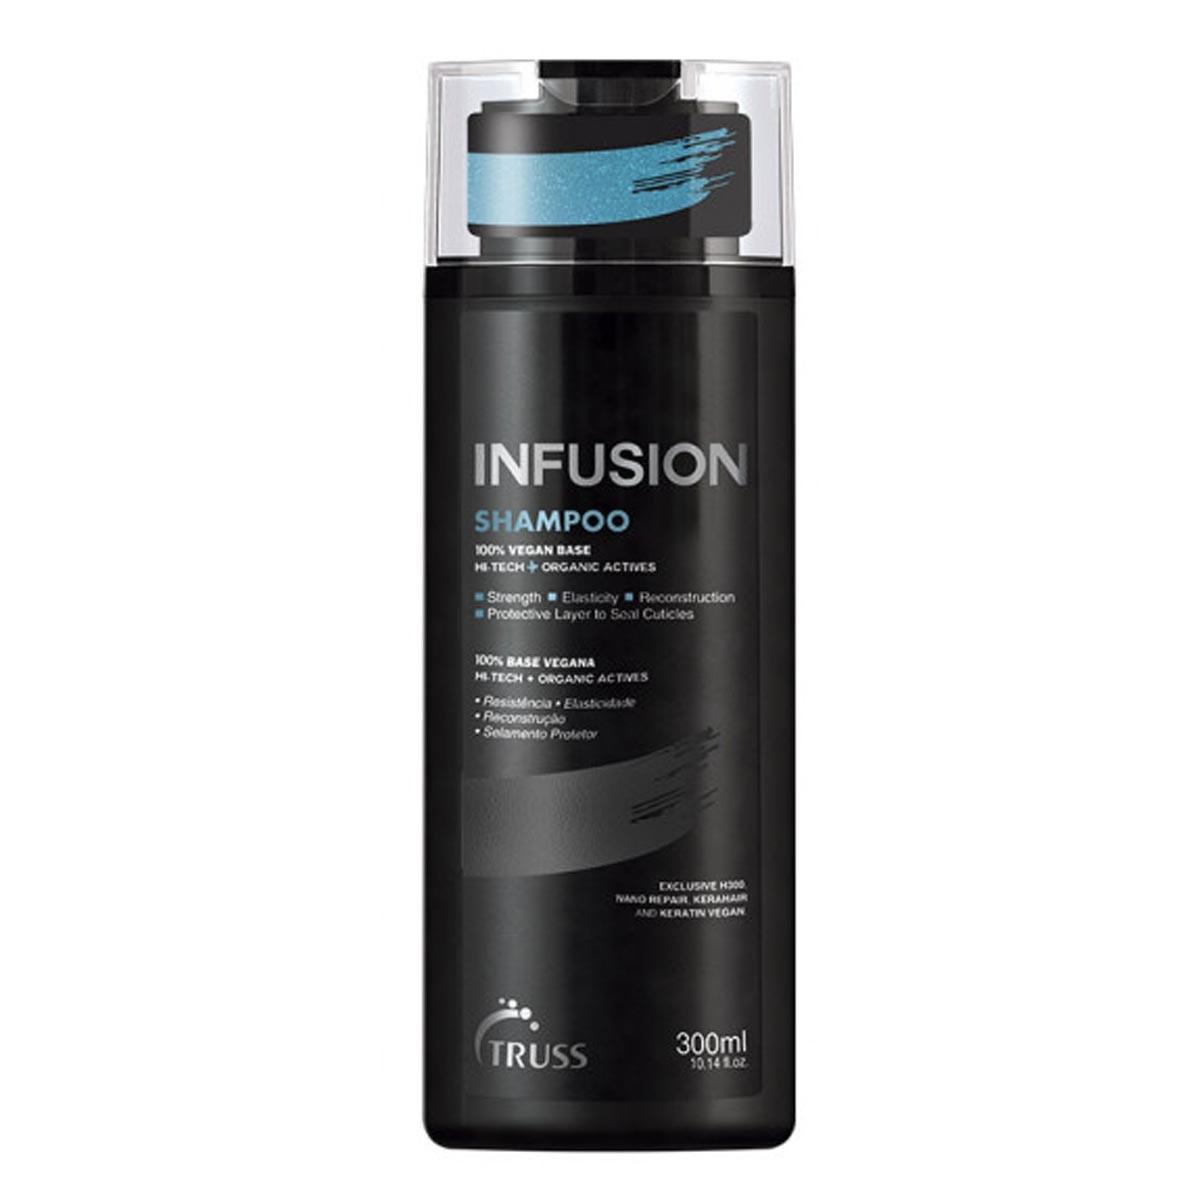 Truss Shampoo Infusion 300ml